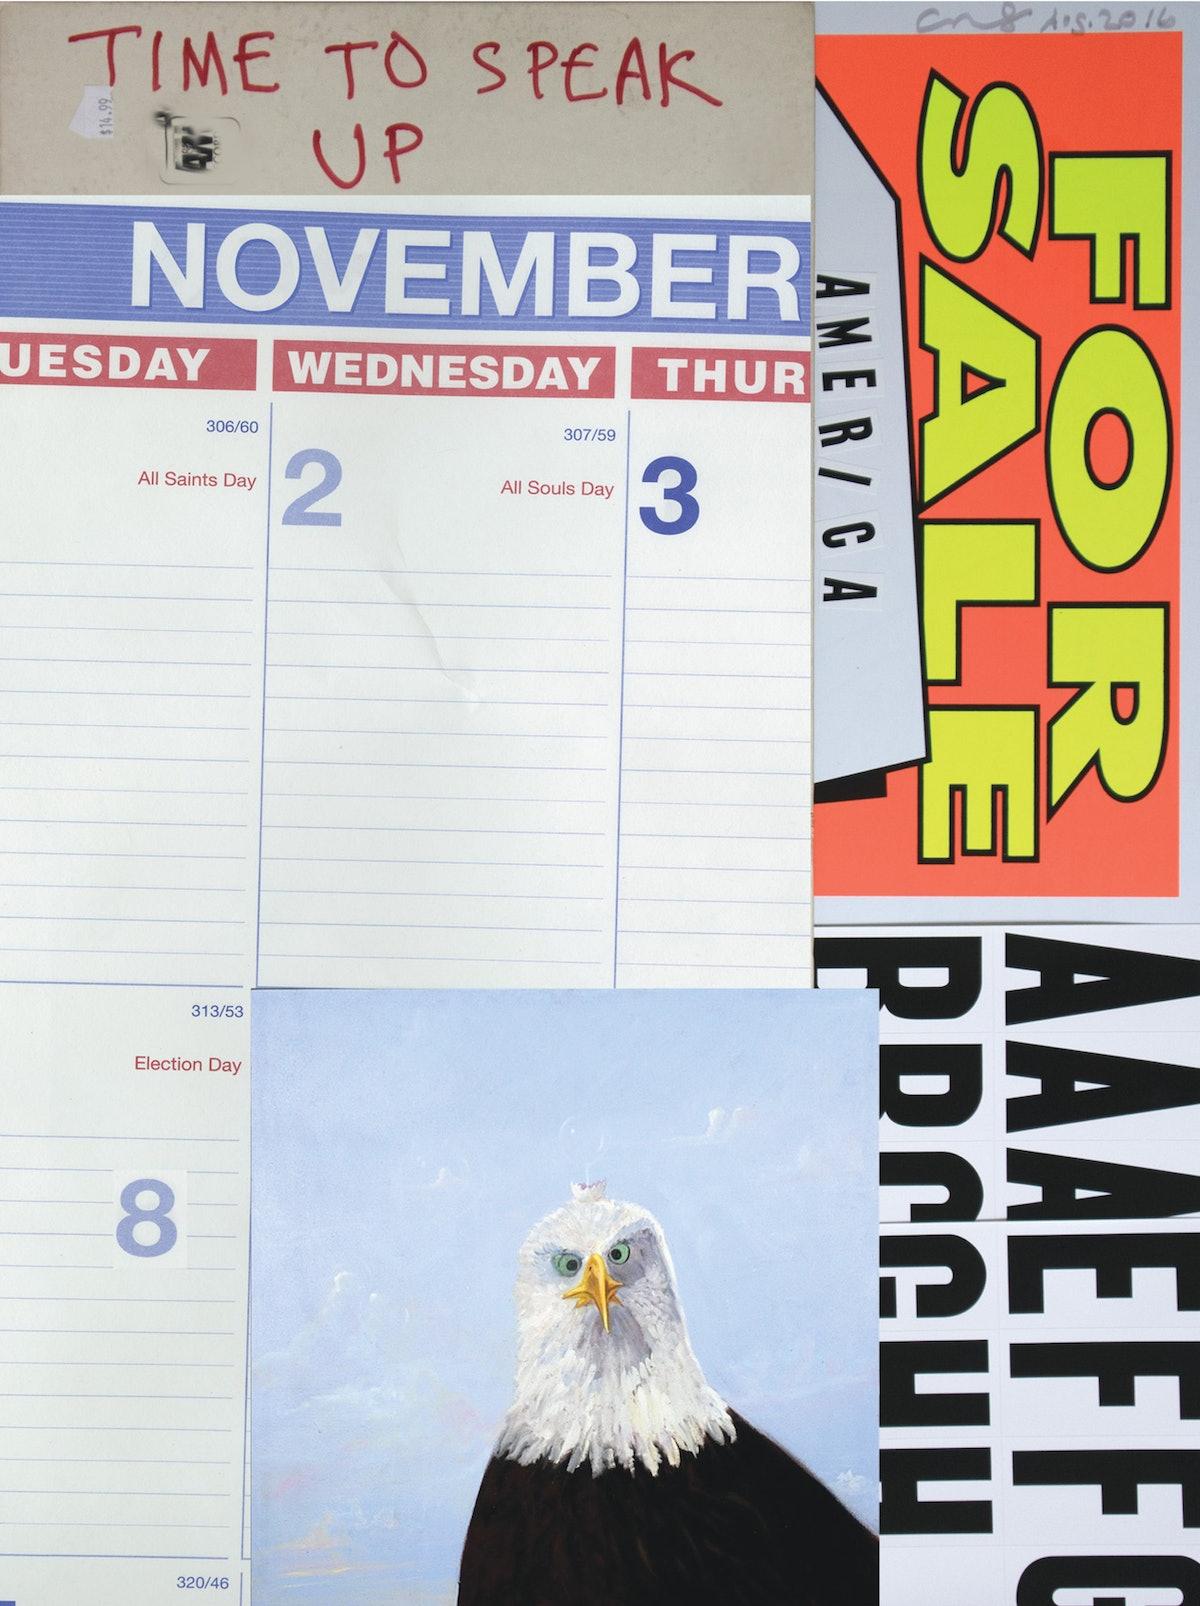 November Political Poster